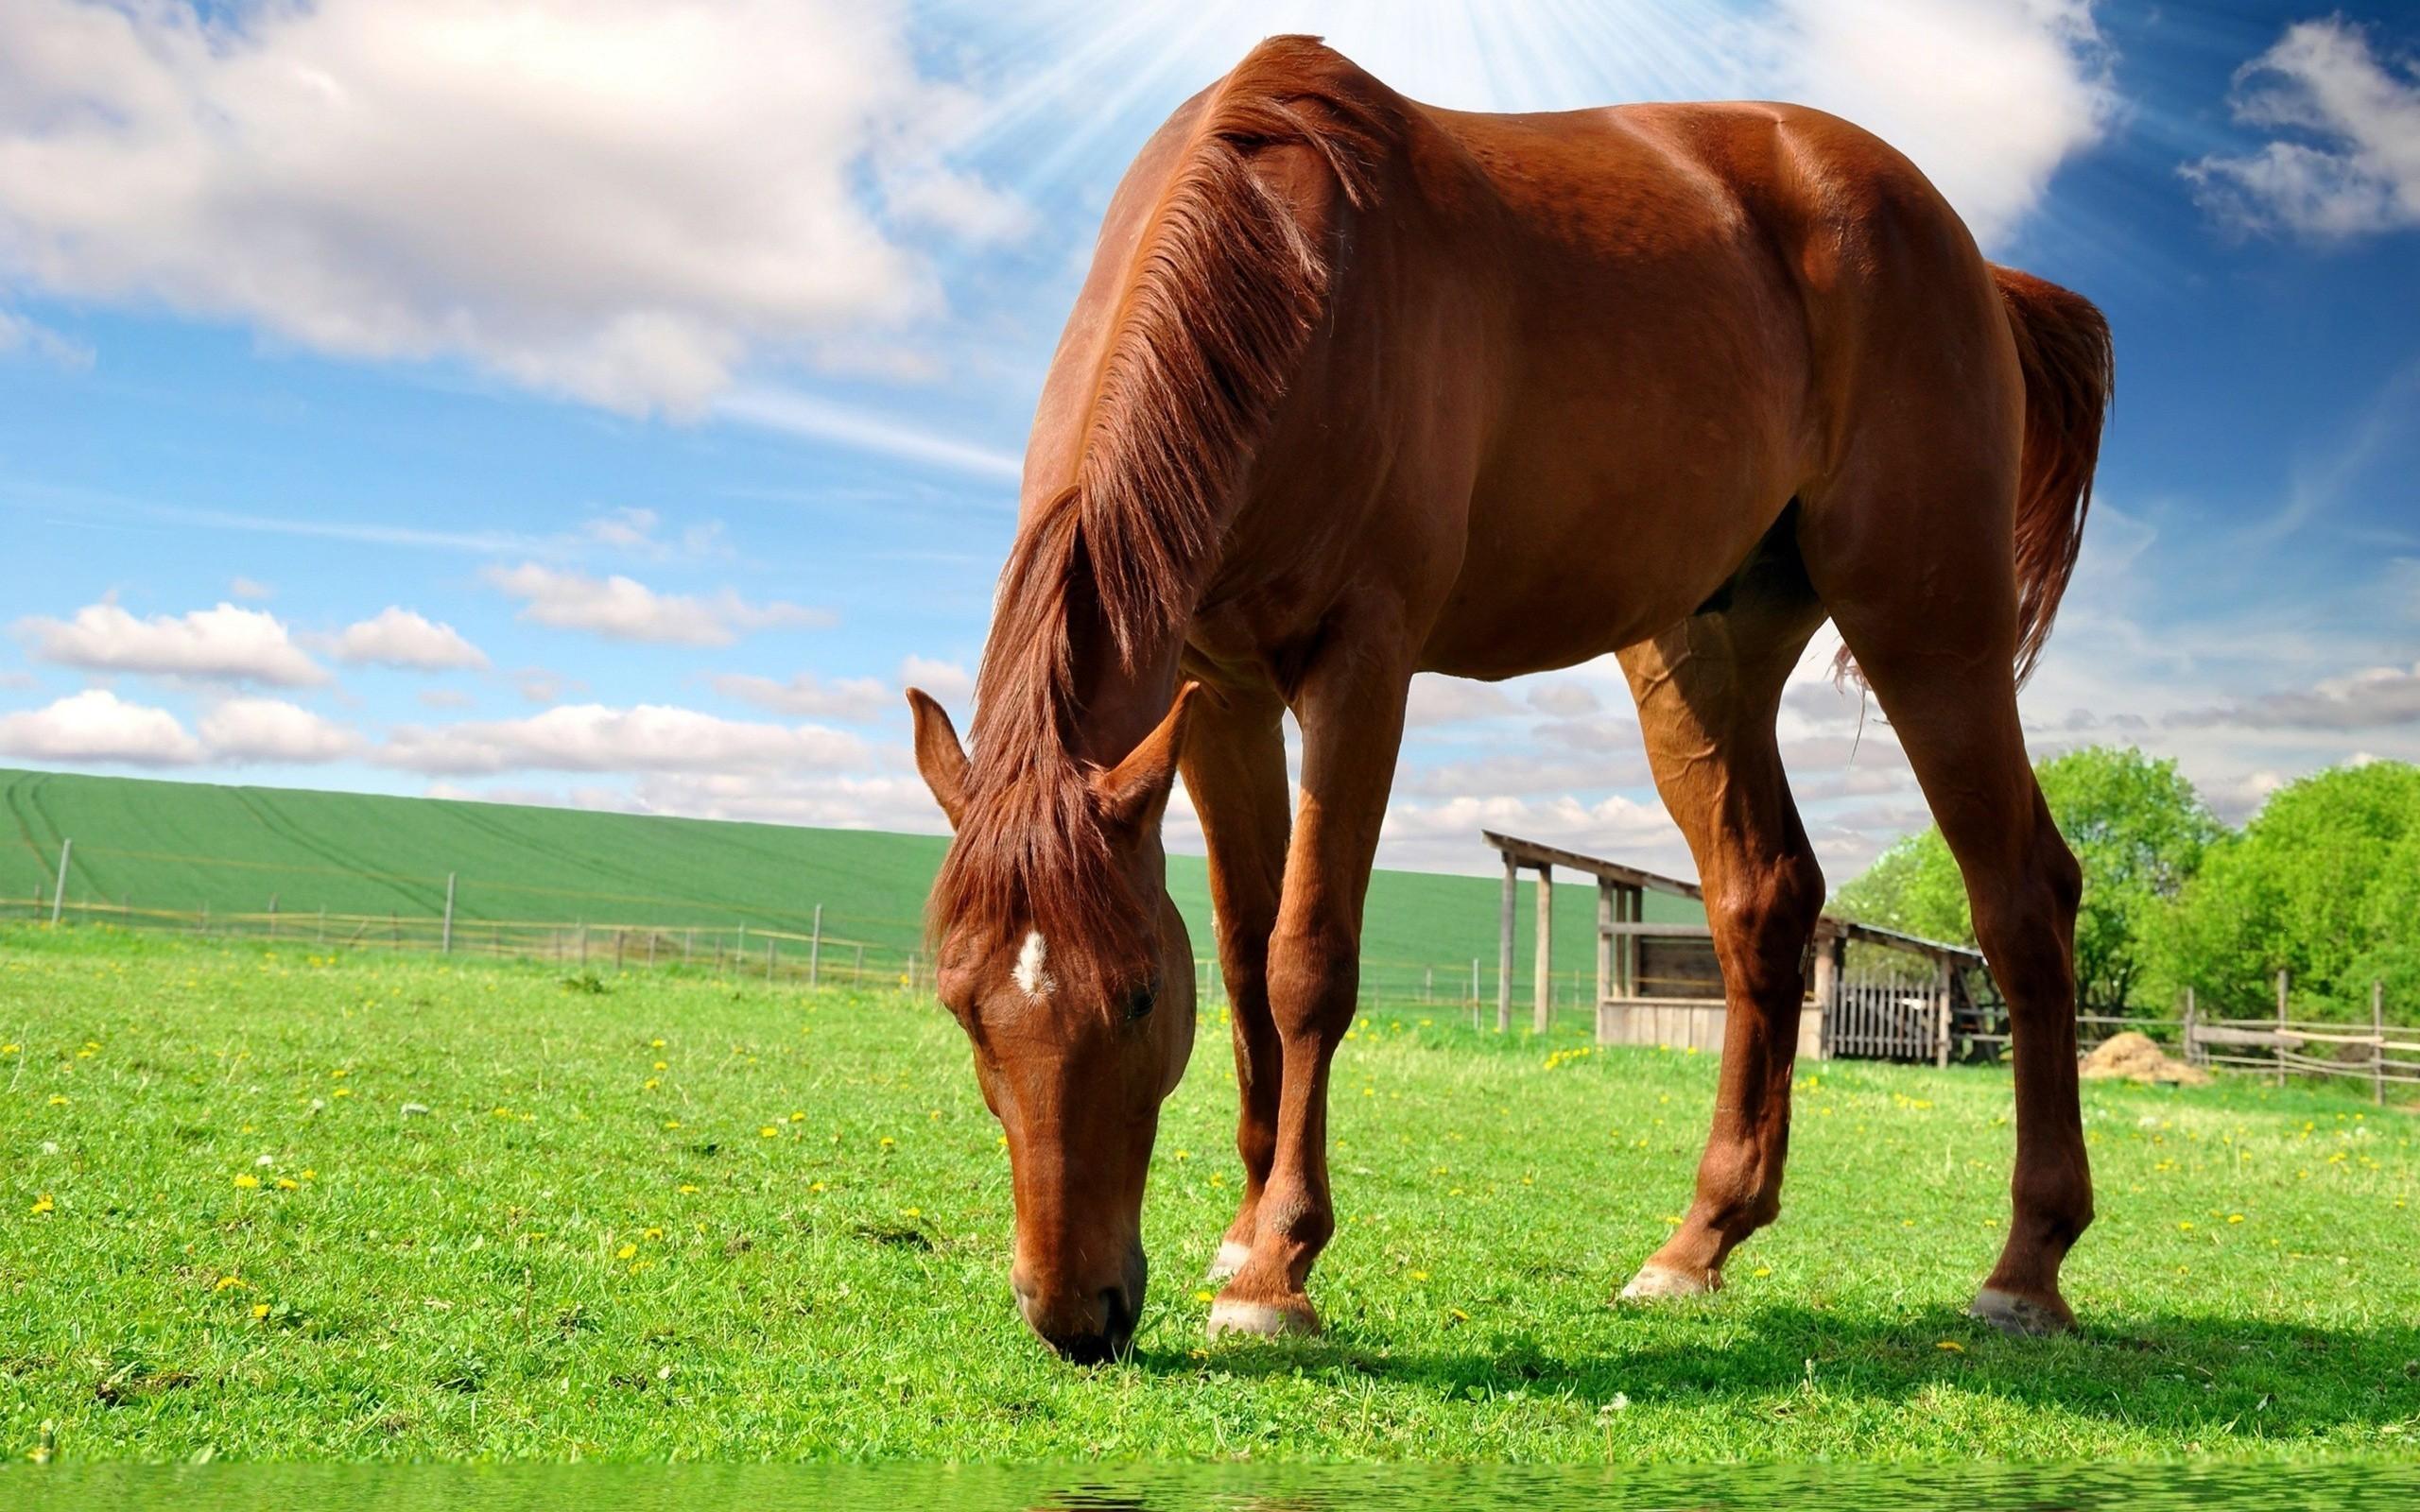 Horse Wallpaper For Computer Wallpapertag